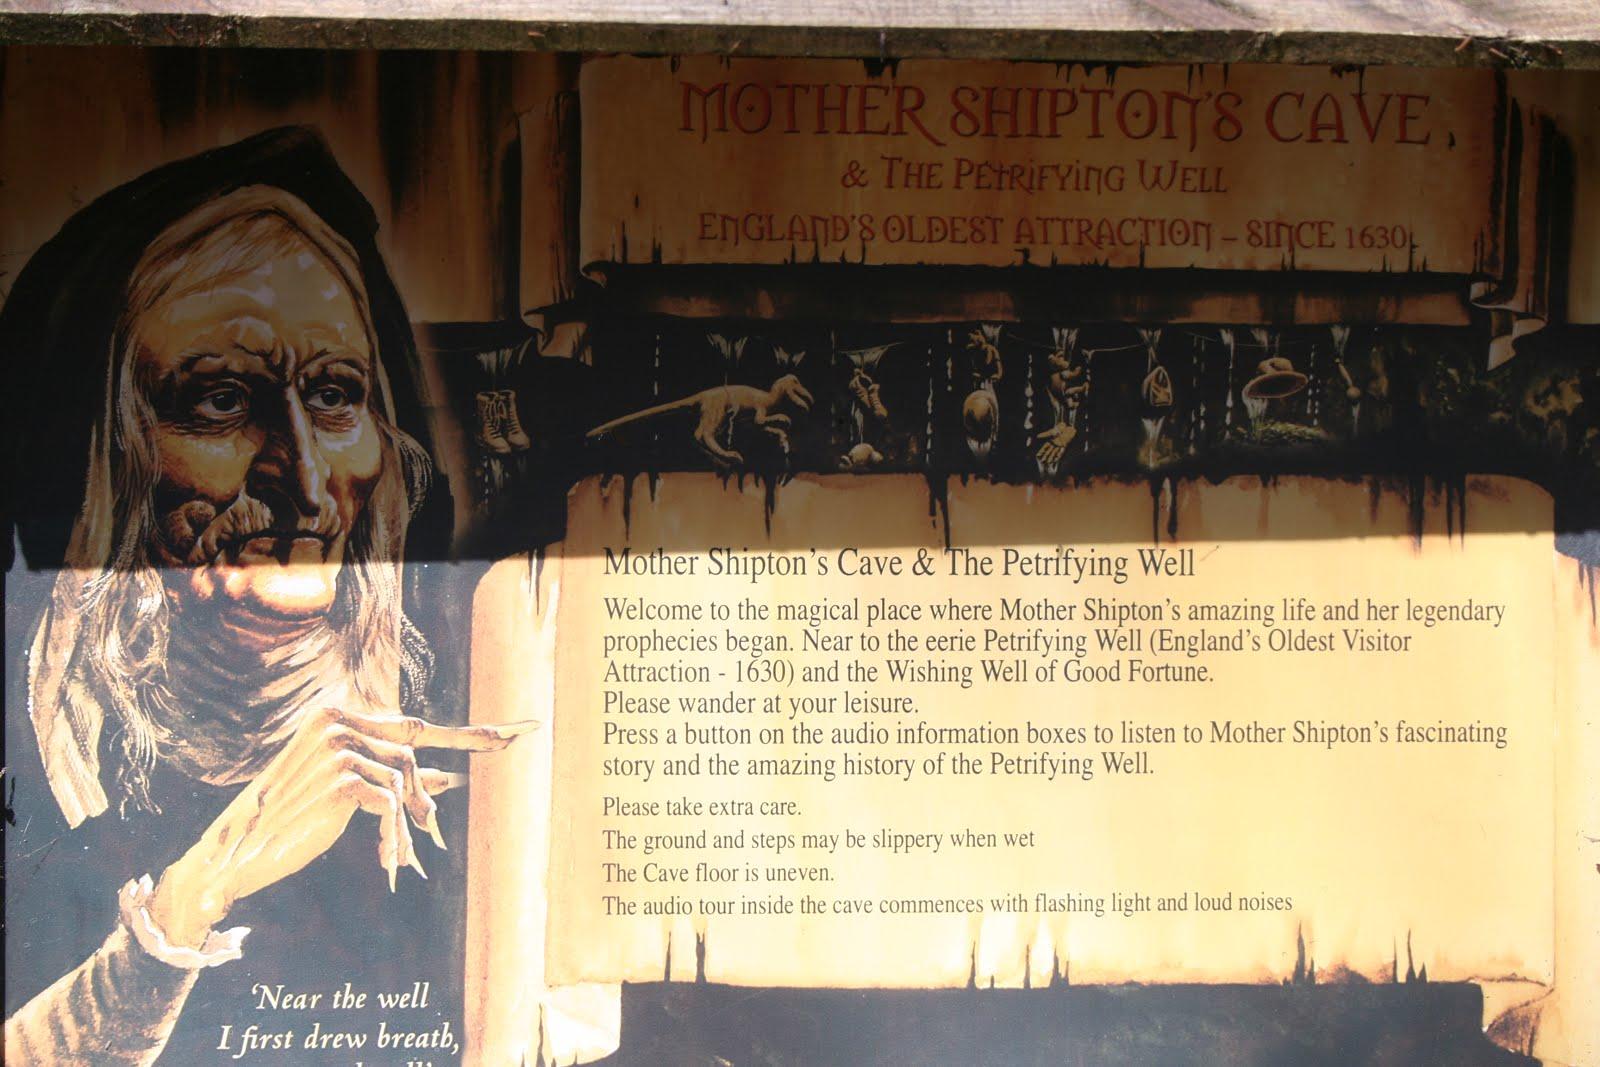 IMG 3810 - Nostradamus'u Gölgede Bırakan Kahin: Shipton ANA